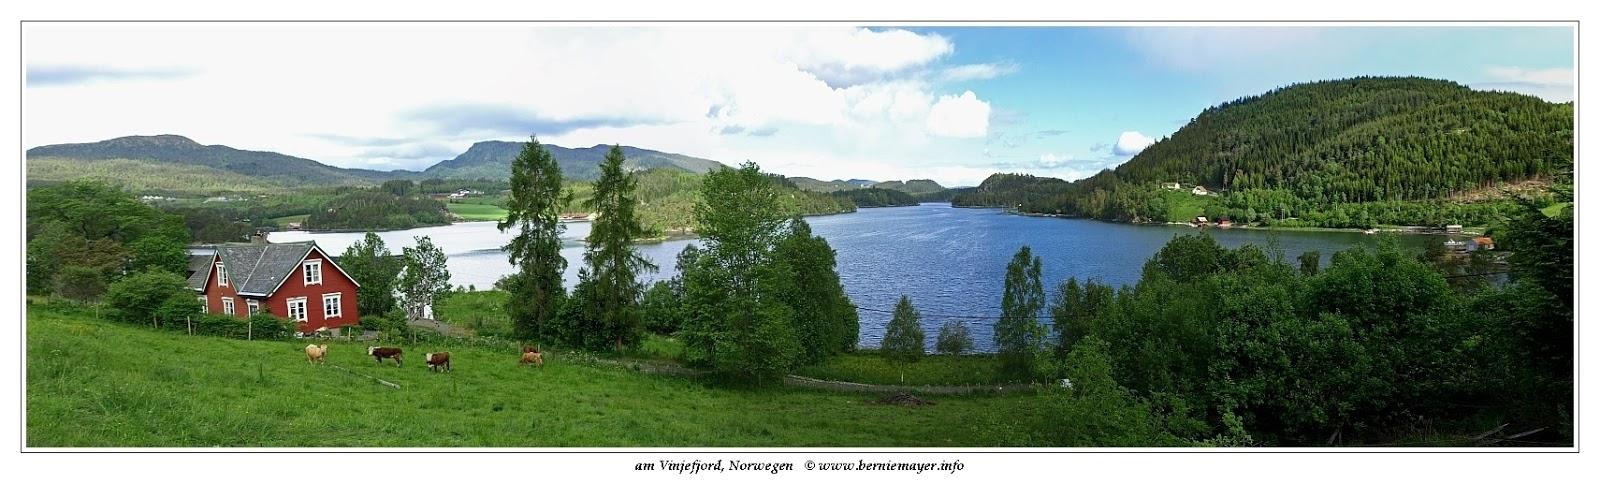 Vinjefjord